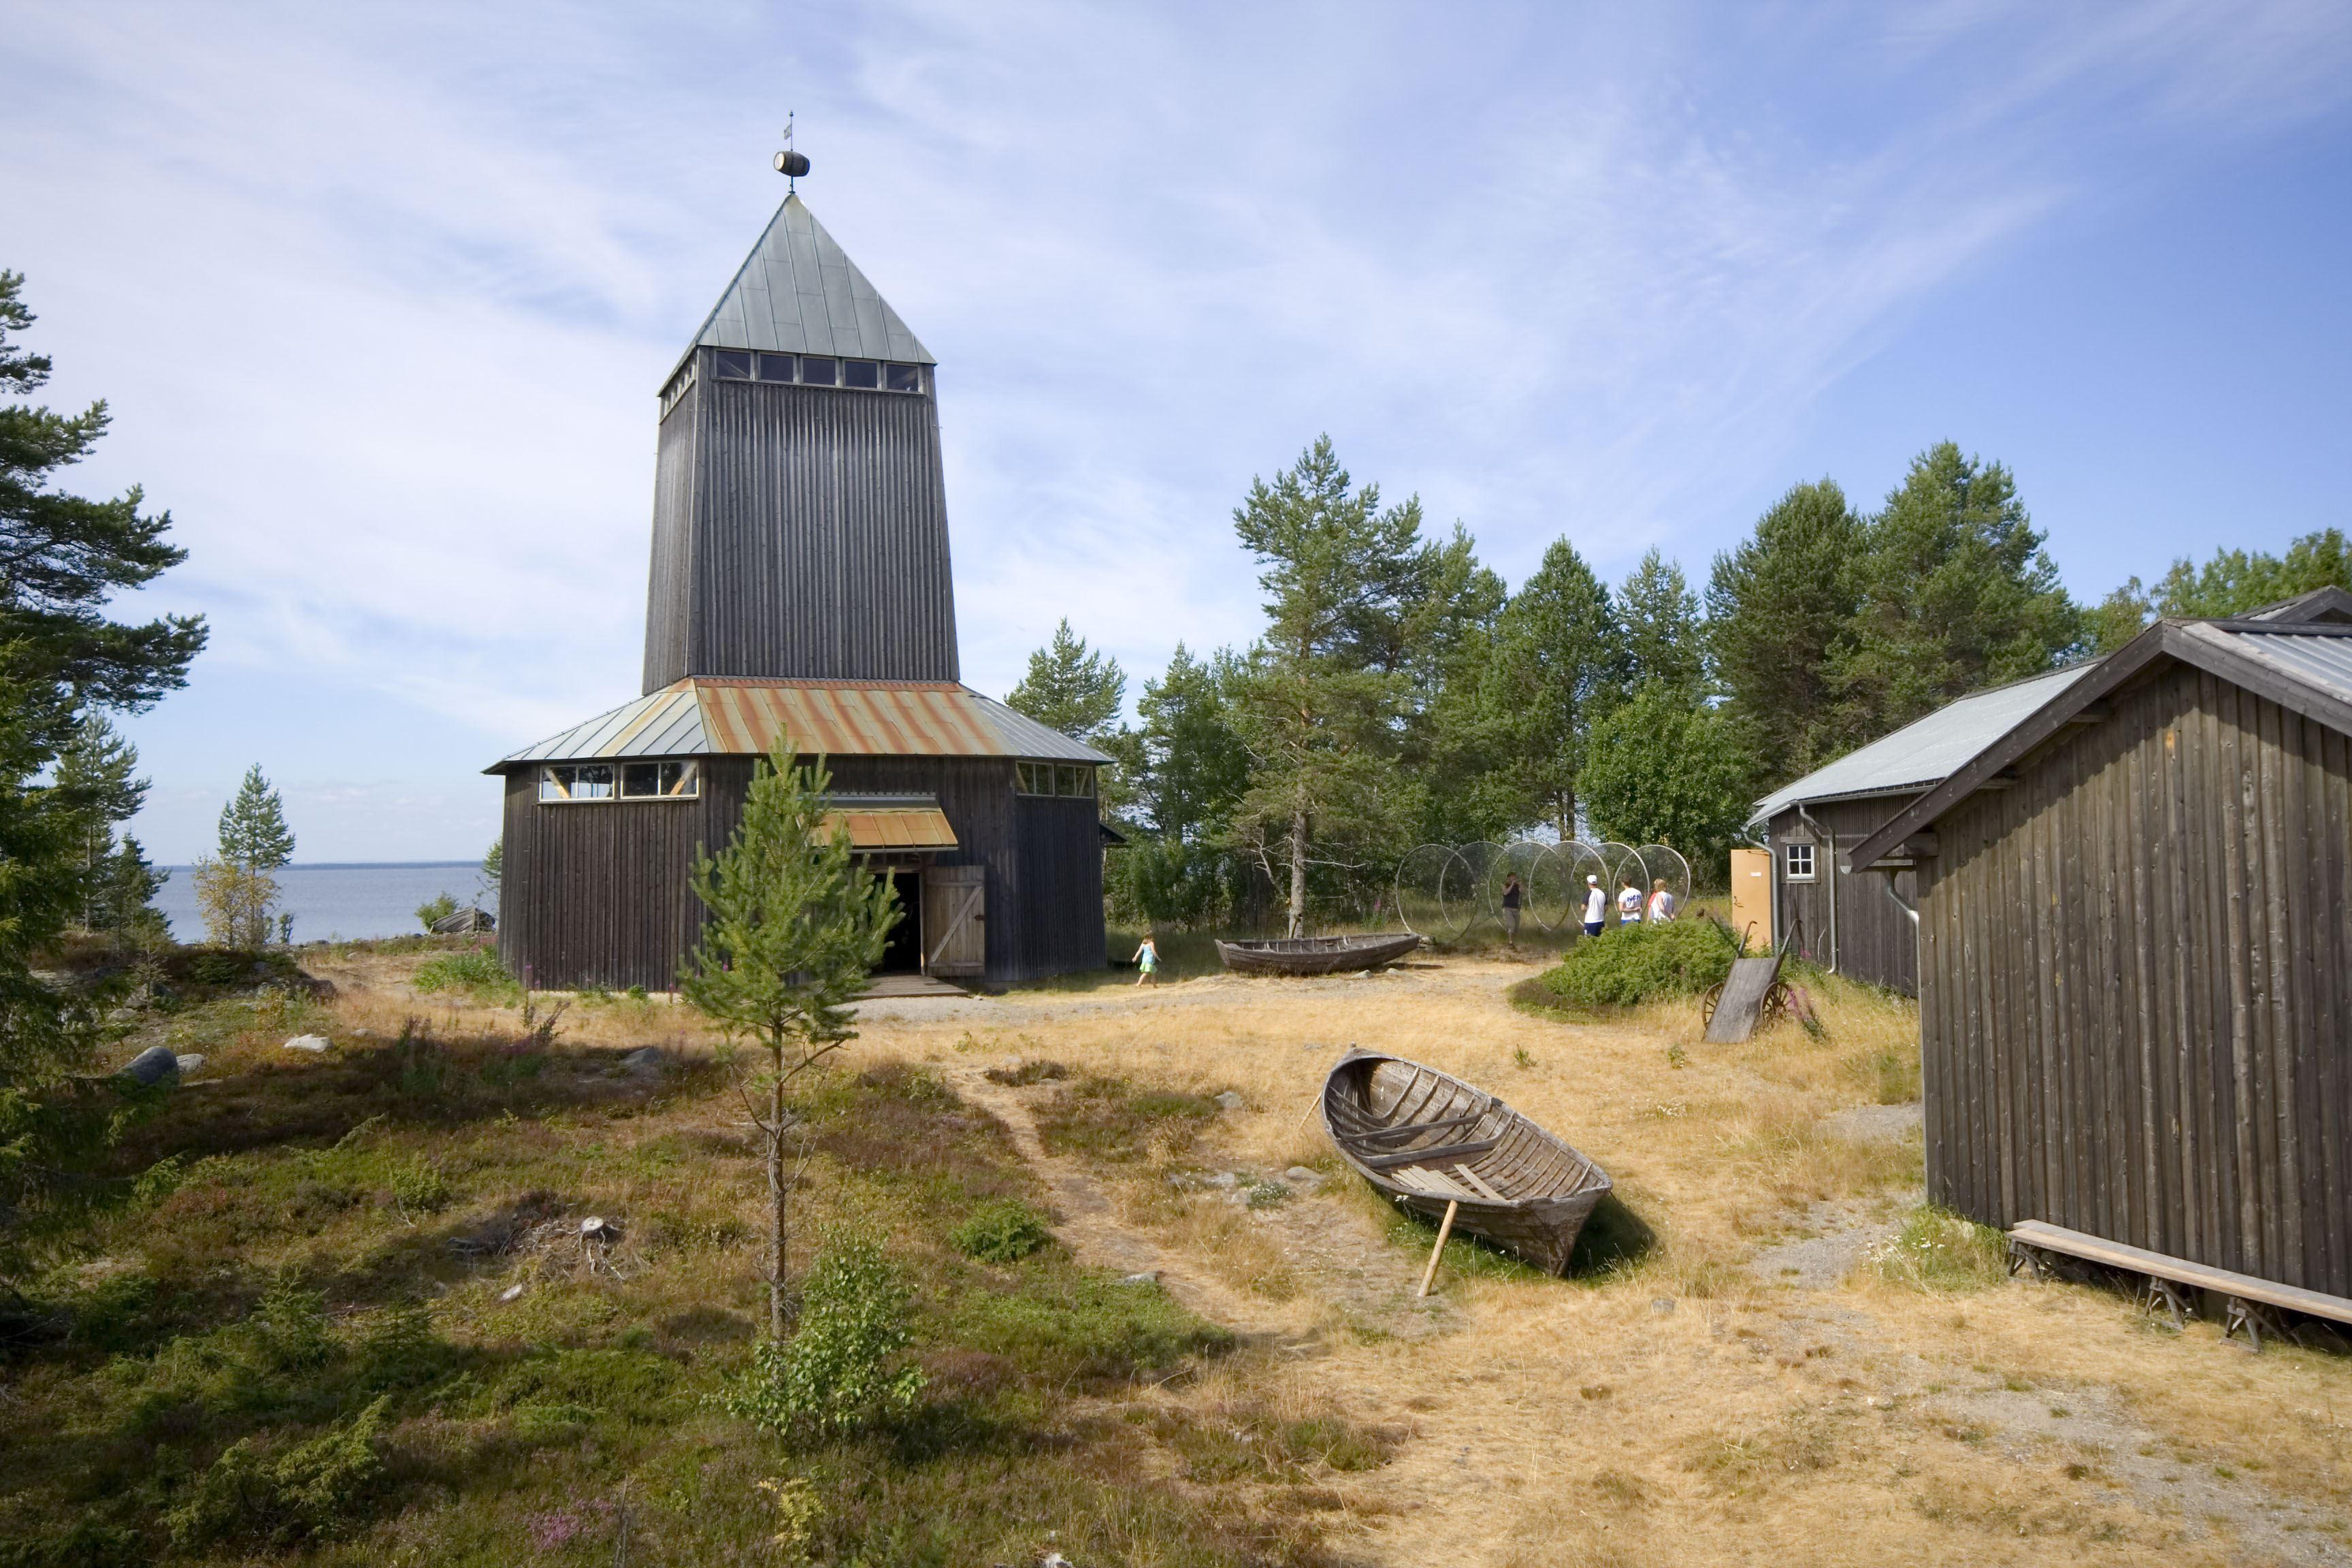 Holmöarnas naturreservat